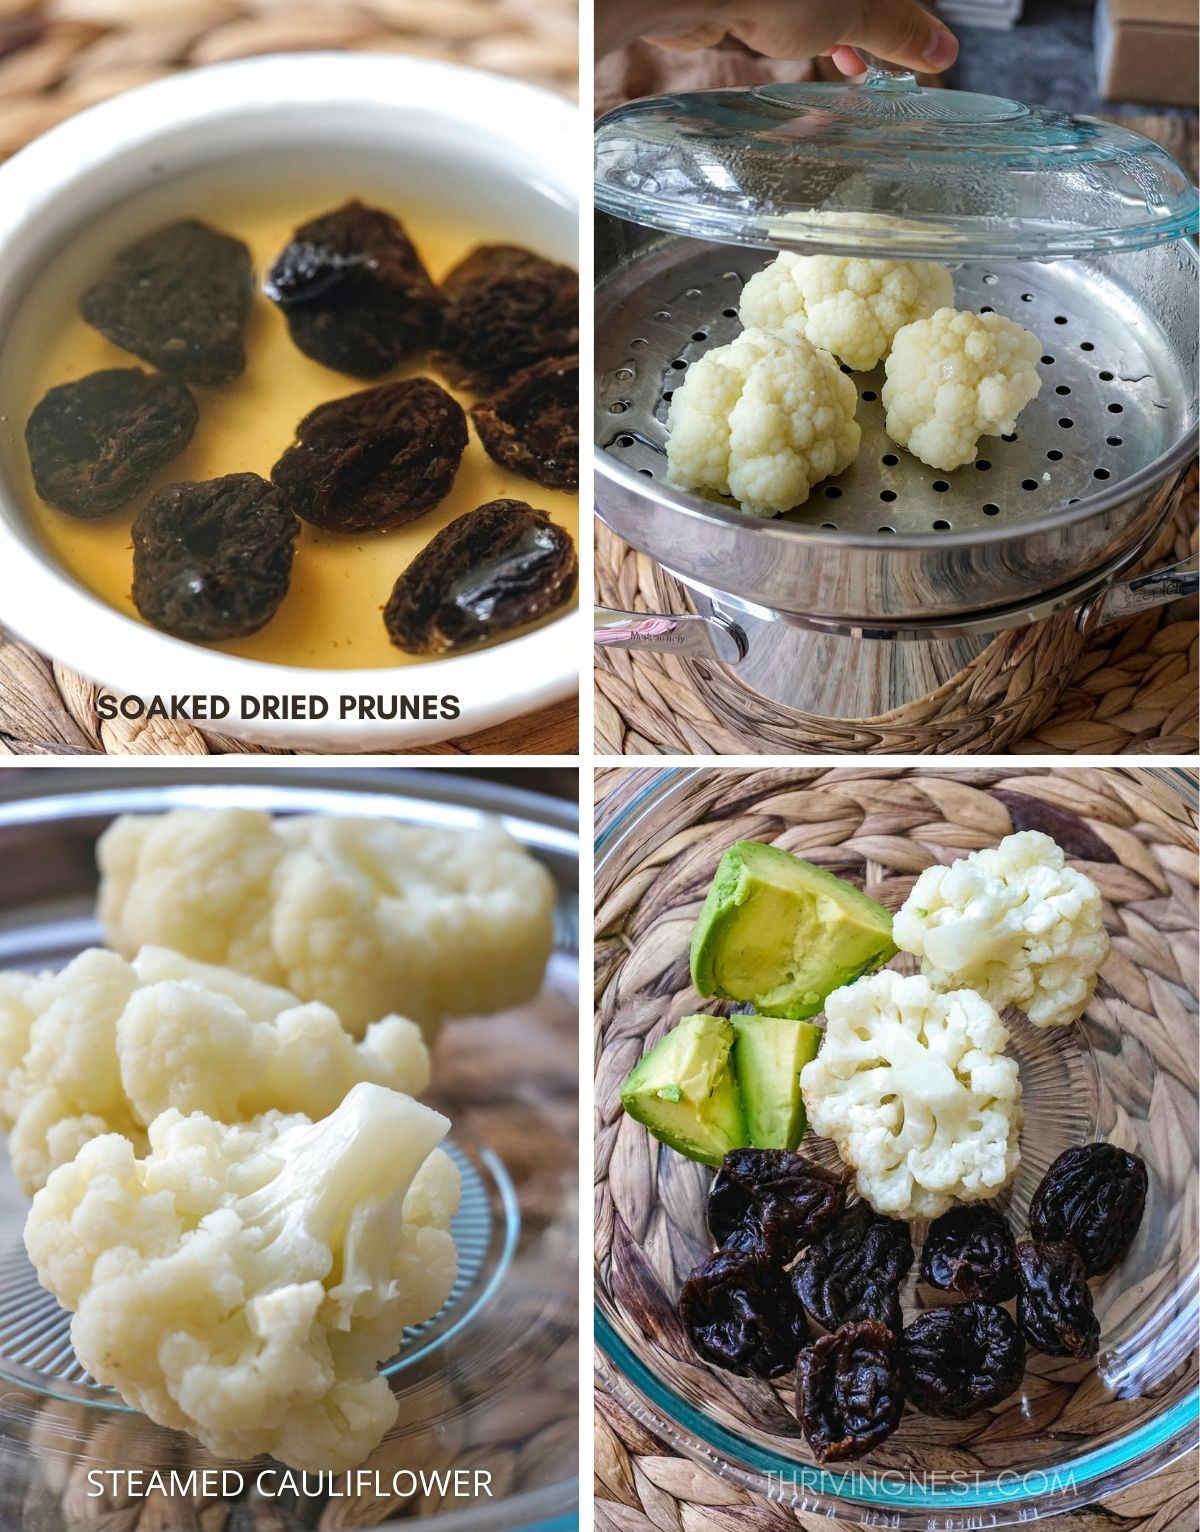 Ingredients to make prune avocado cauliflower puree.